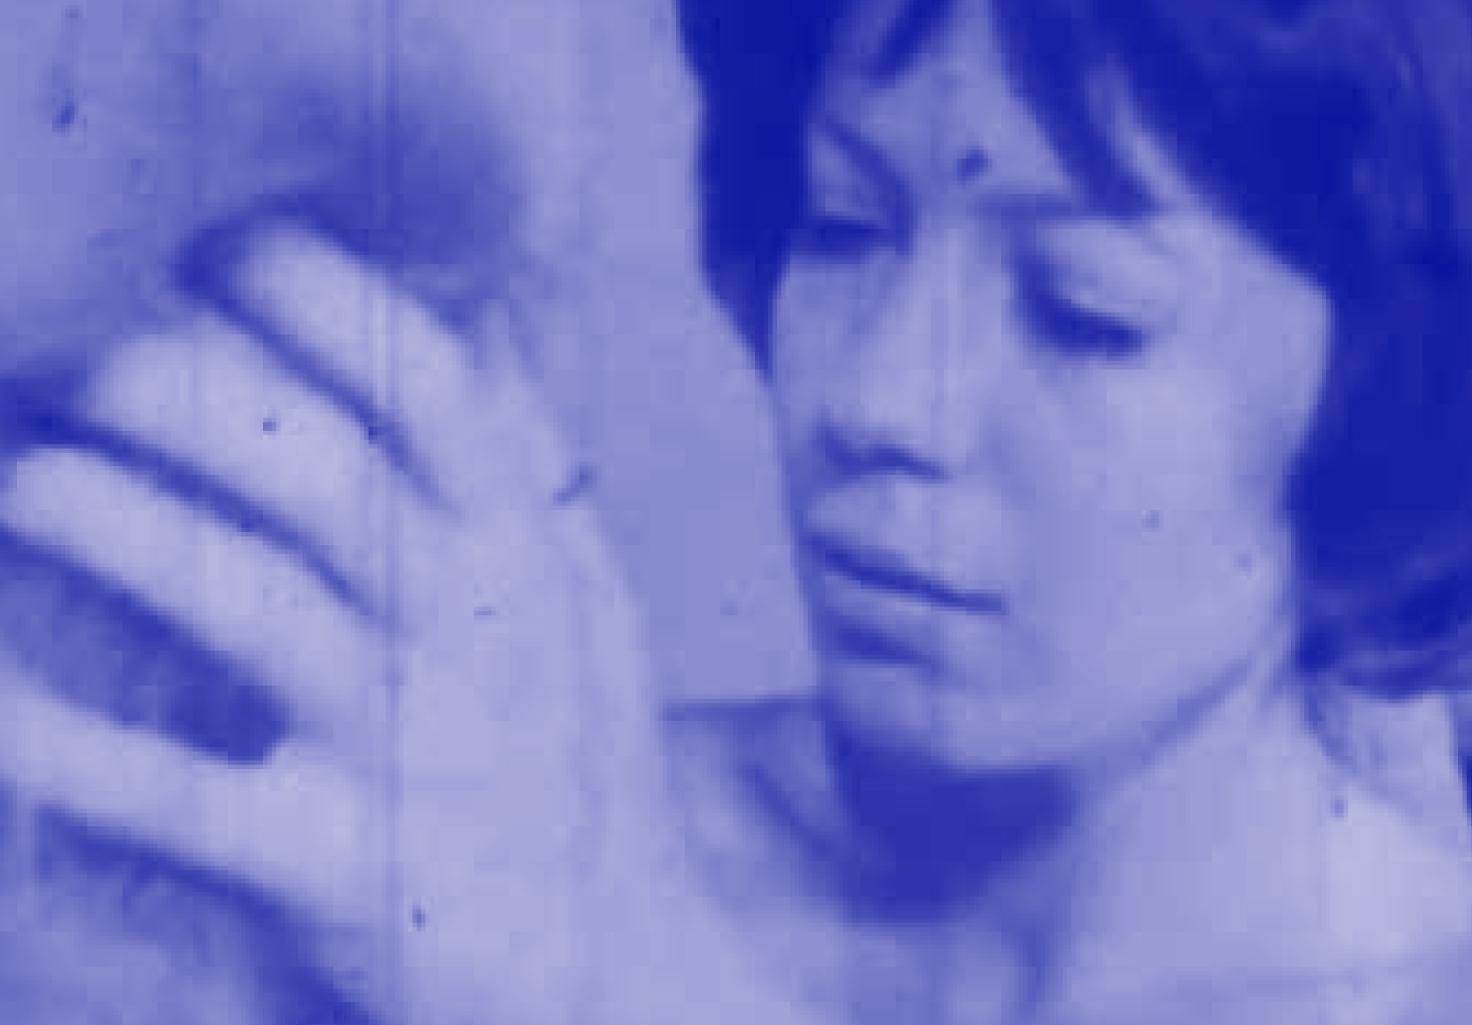 Eva Stefani, Acropolis (tinted in blue)